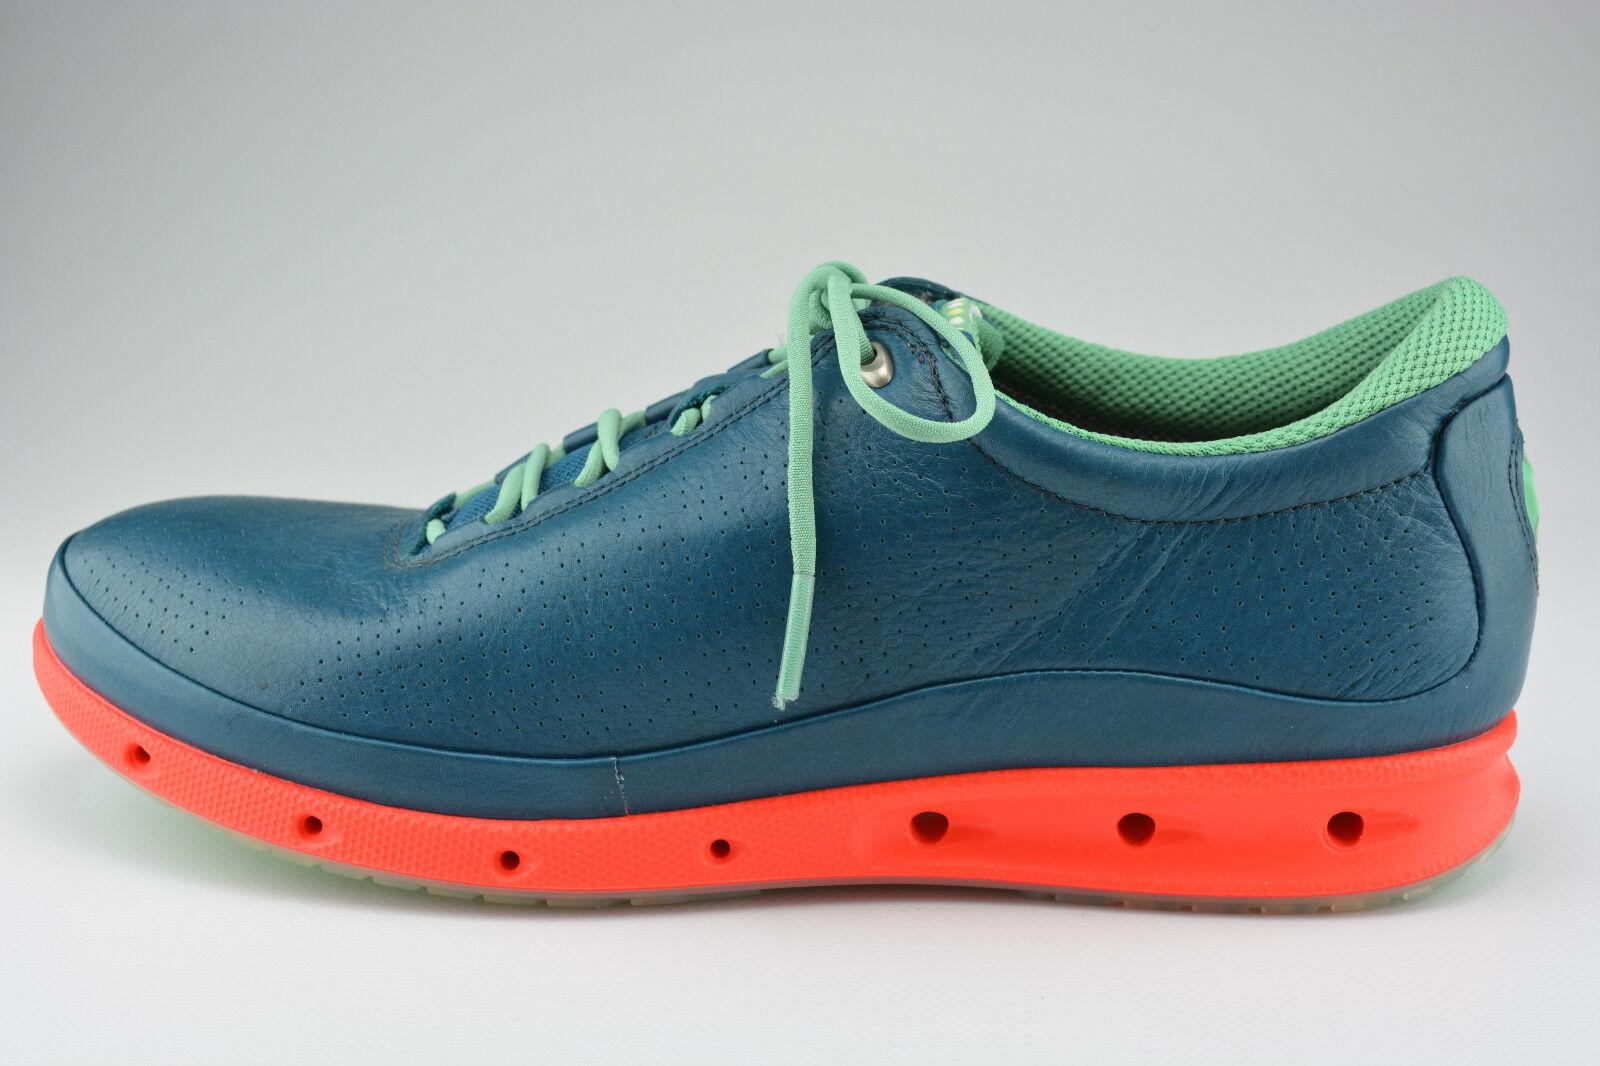 Ecco Schuhe Damen Schnürer COOL grün sea port Glattleder Gore Tex Surround